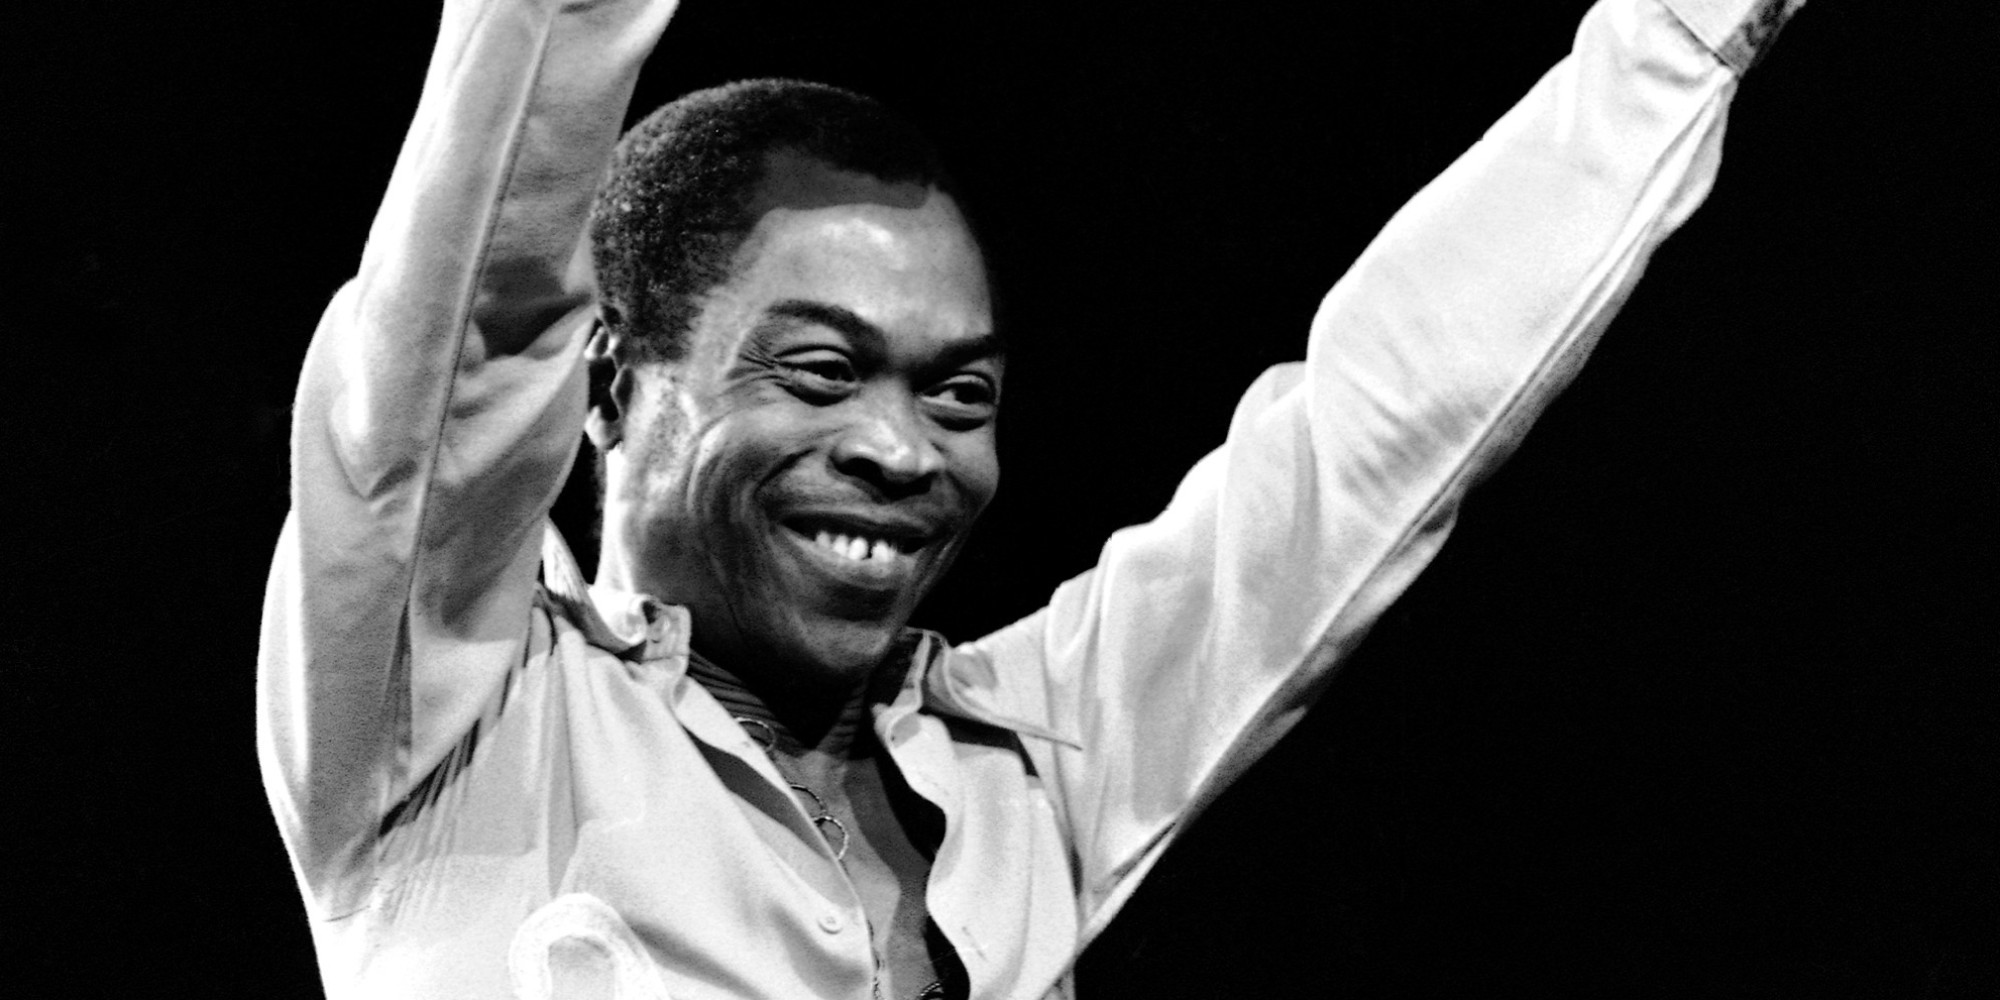 Finding Fela: Fela Kuti sorride in una foto di repertorio tratta dal documentario